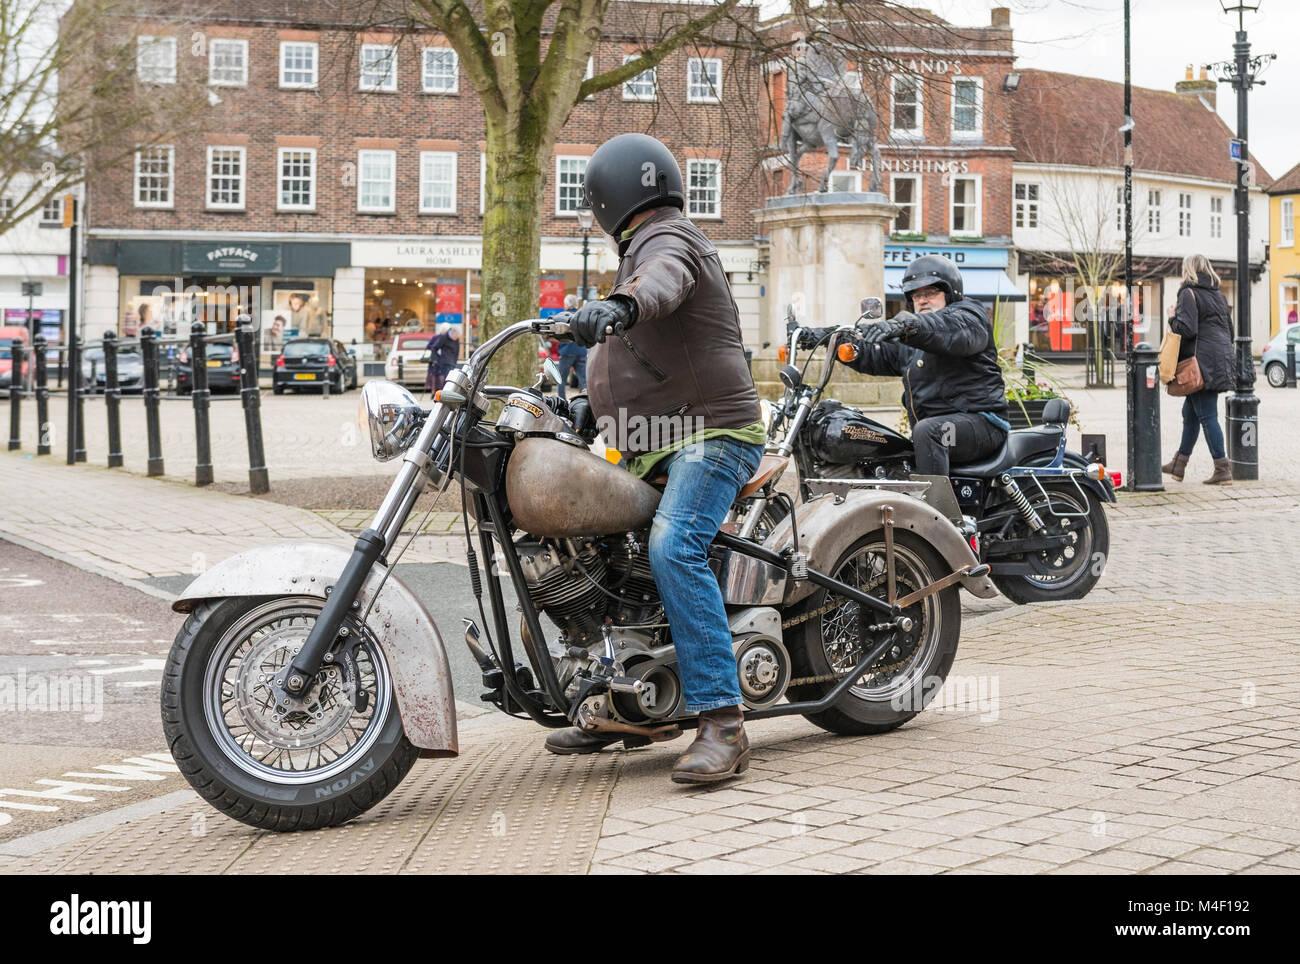 Paar mittleren Alters Männer Harley Davidson Motorräder in England, Großbritannien. Stockbild